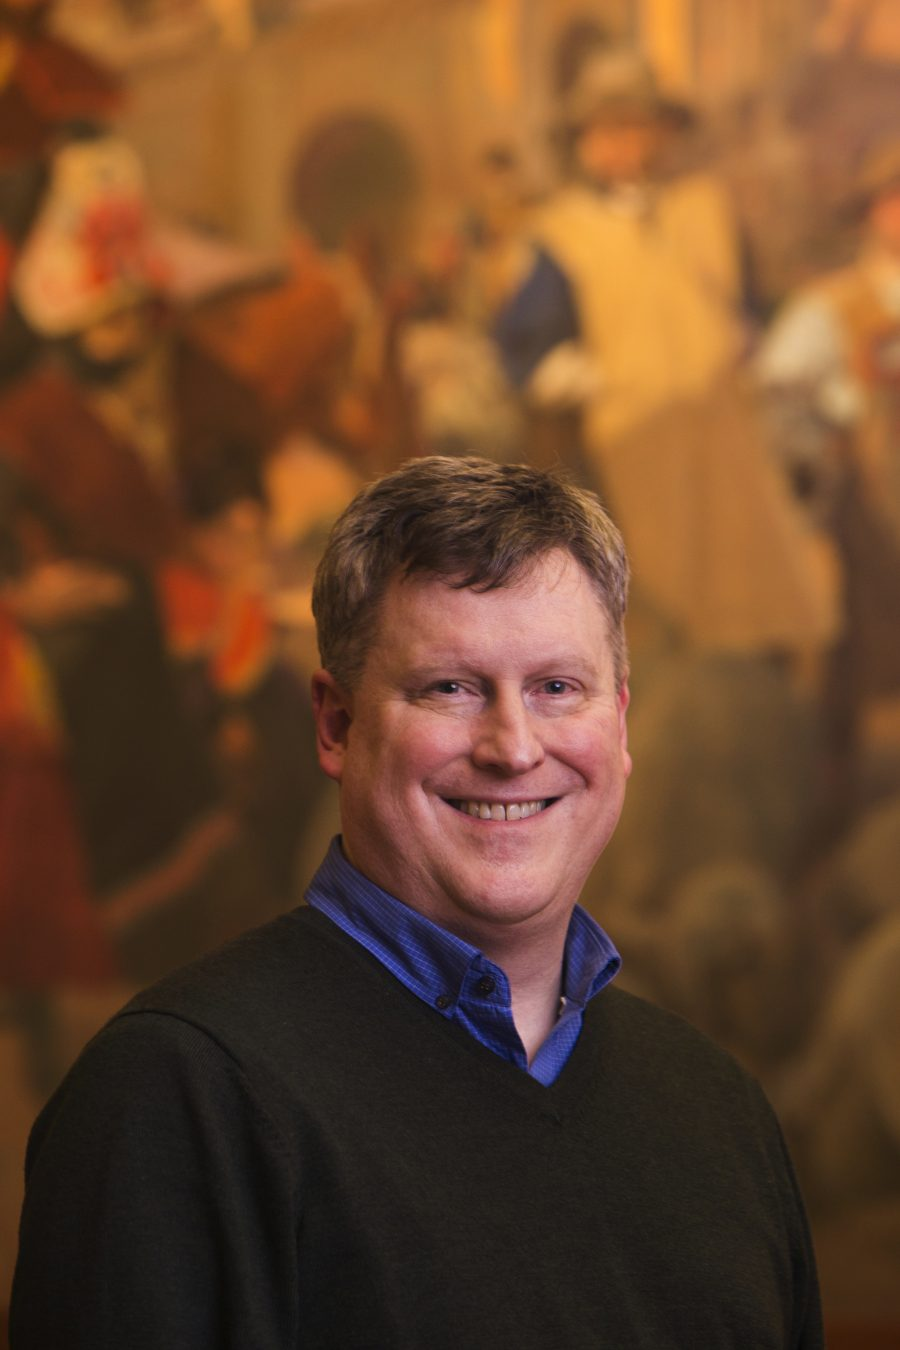 Dr. Patrick Lenaghan